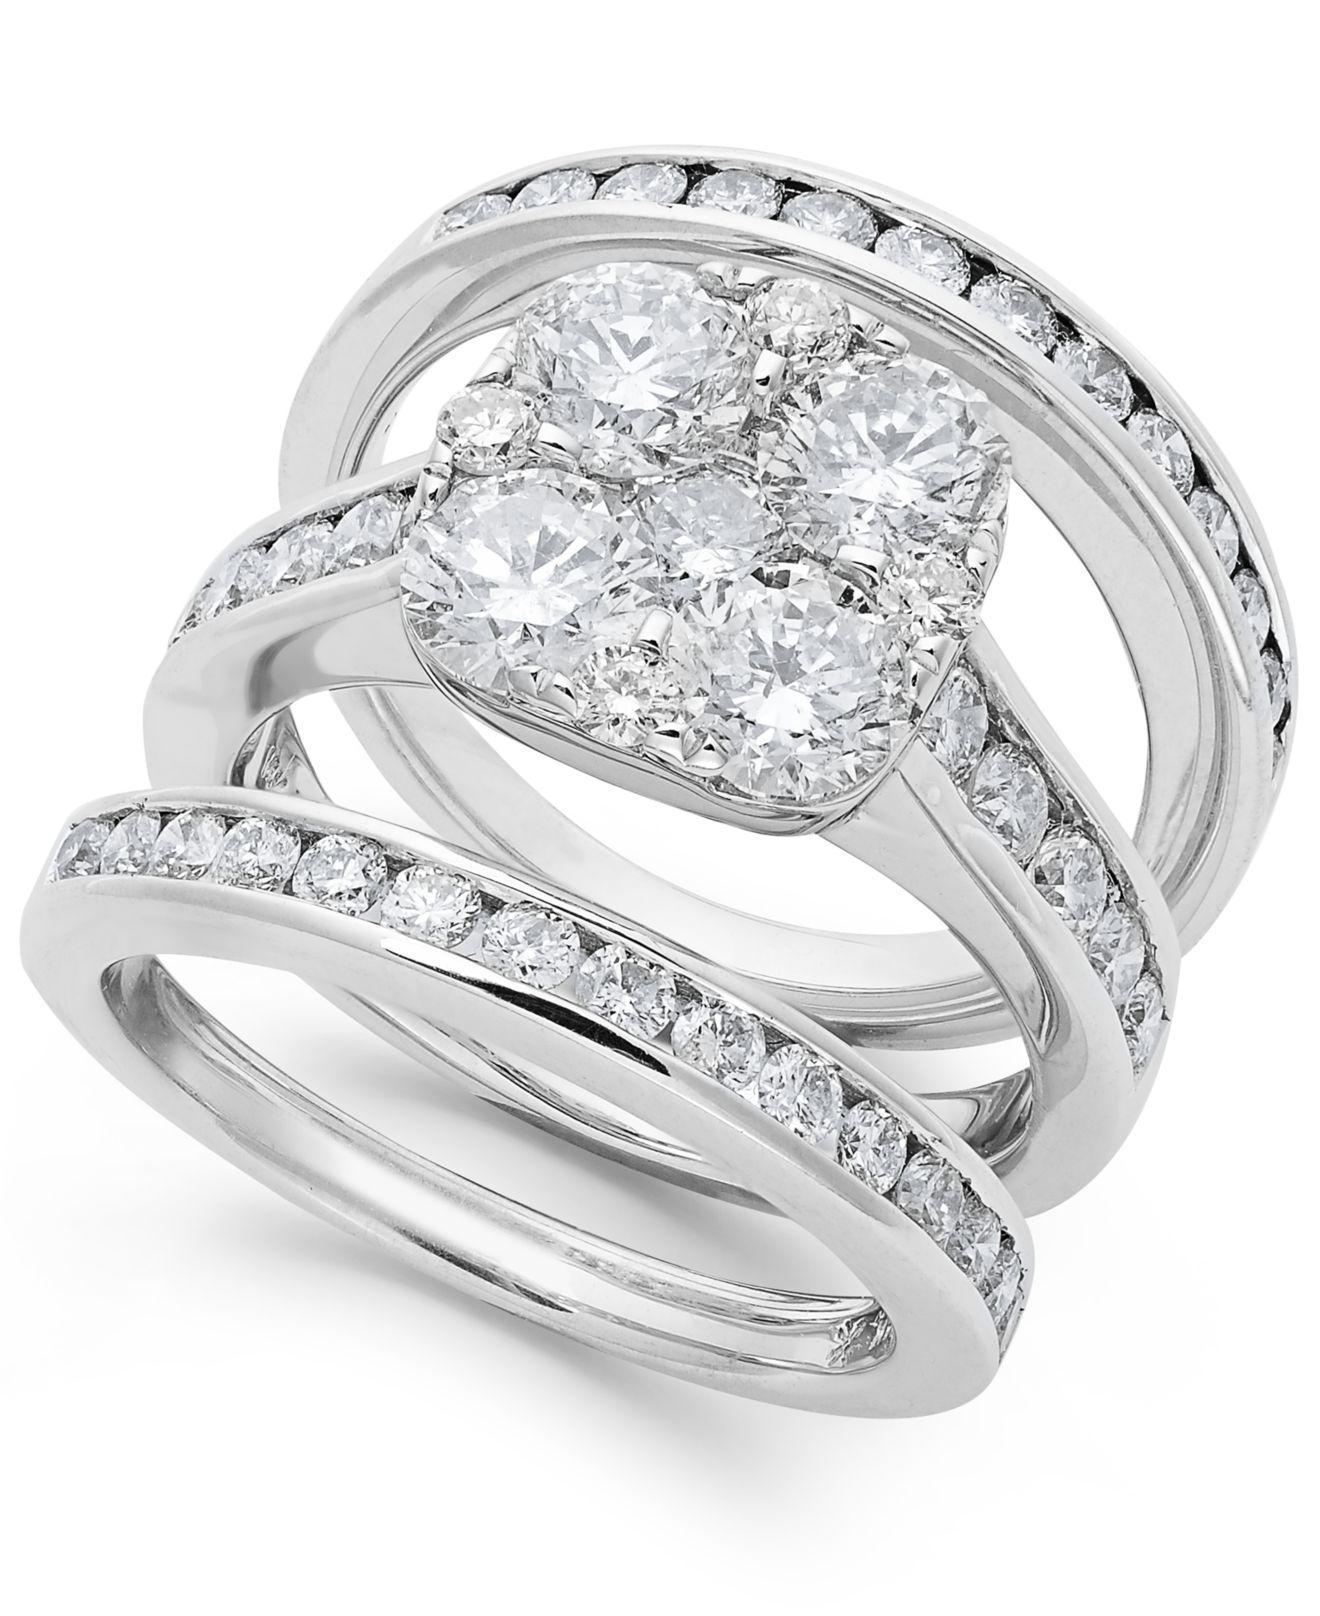 Macy s Diamond Bridal Set In 14k Gold 3 3 4 Ct T w in Metallic